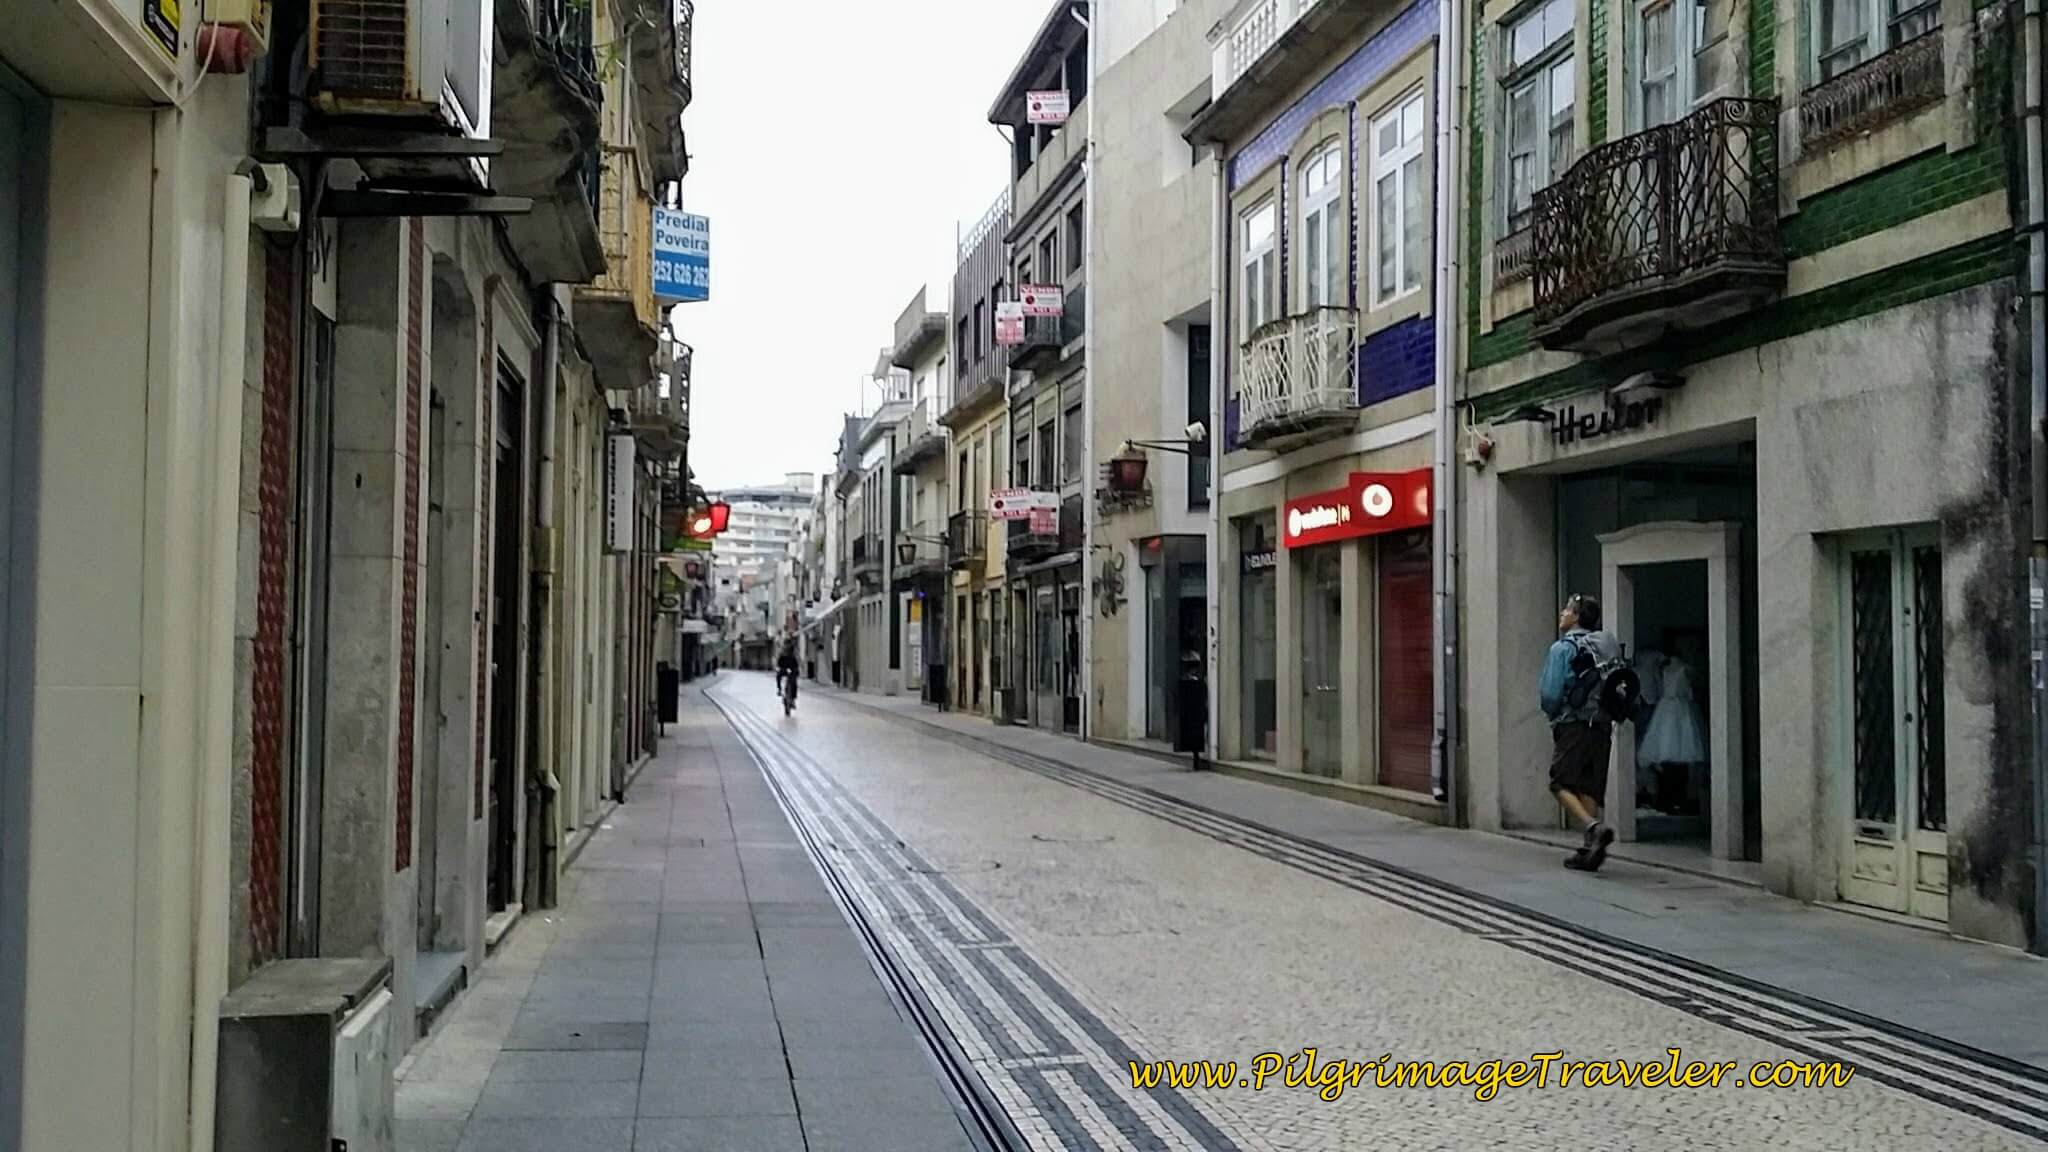 Sleeping Shopping Street of the Rua da Junqueira in Póvoa Varzim on day sixteen of the Camino Portugués on the Coastal Route